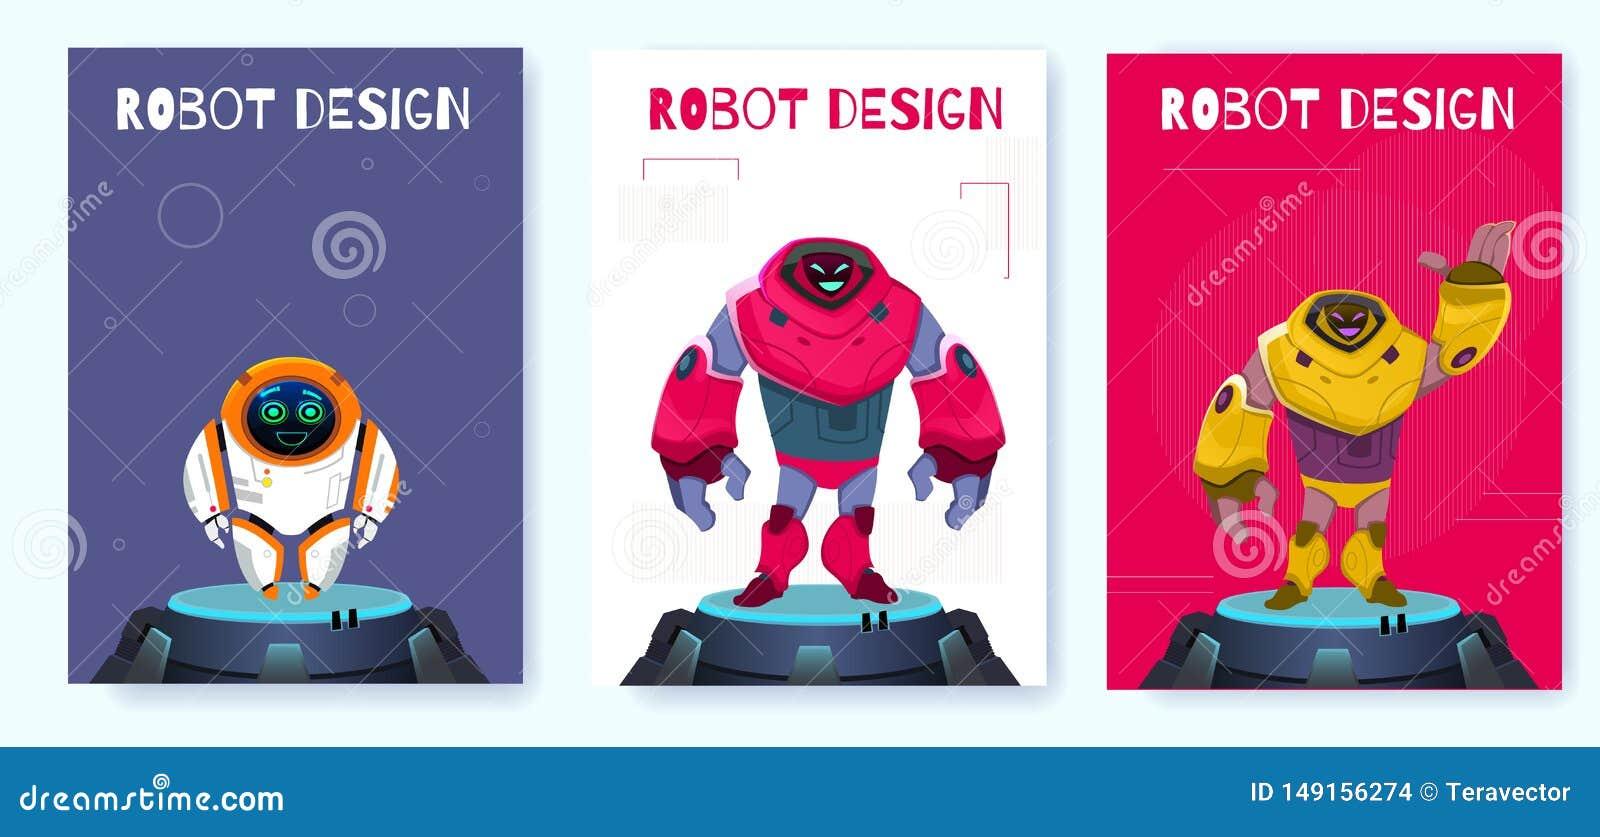 Kreativer Roboter-Entwurf Plakat-Generations